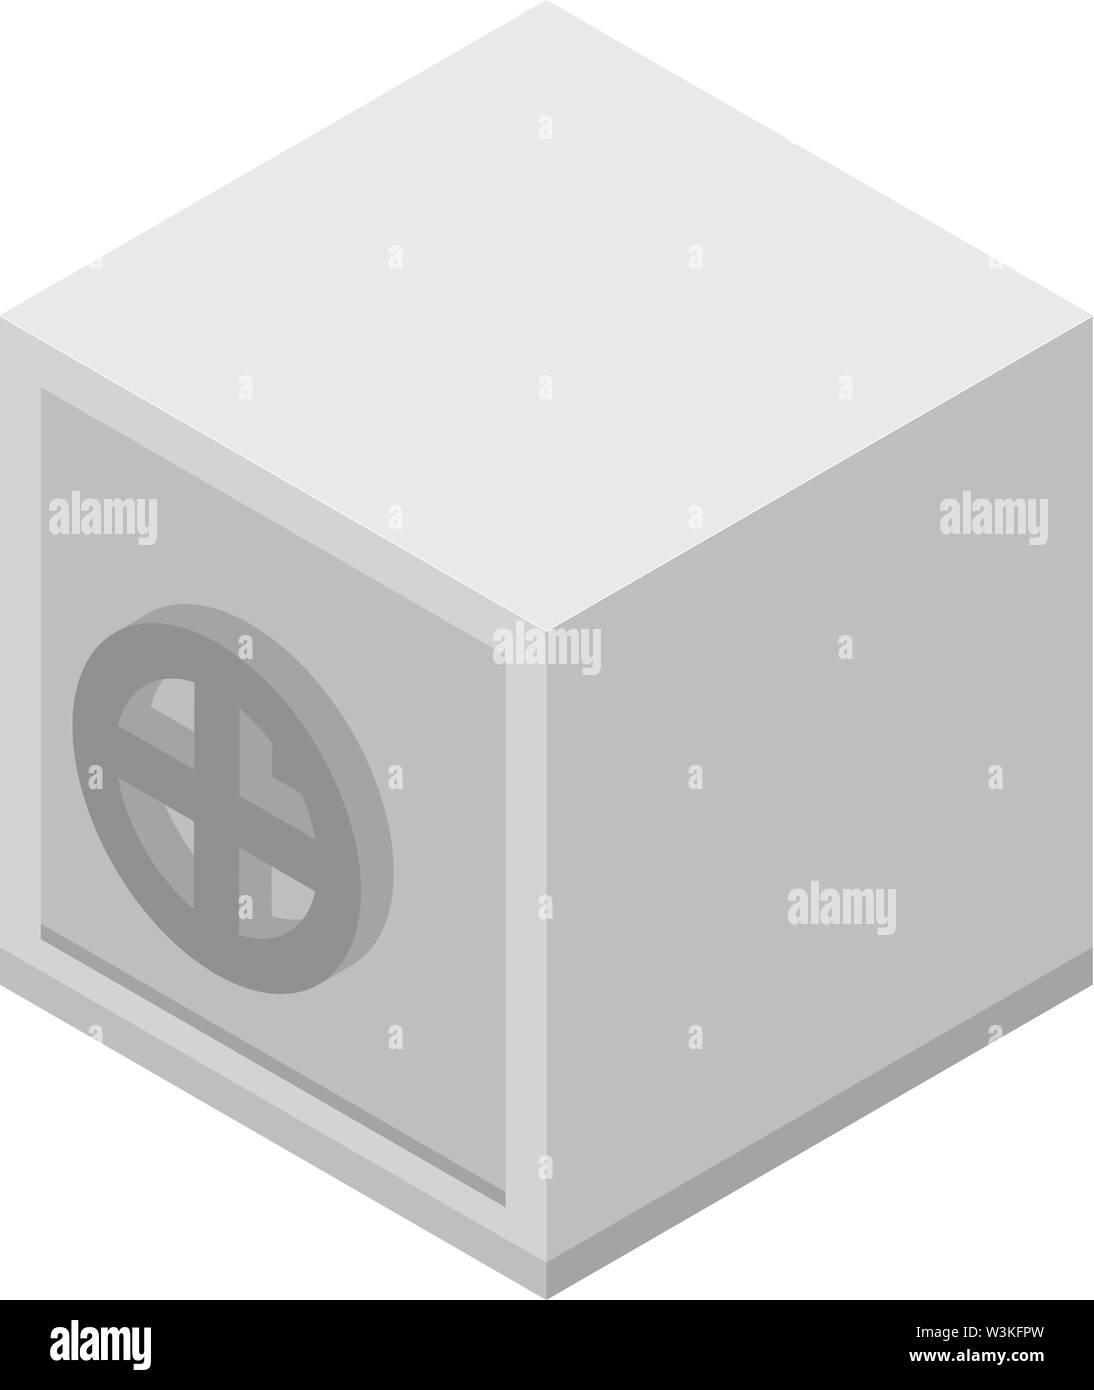 Money metal safe icon, isometric style - Stock Image